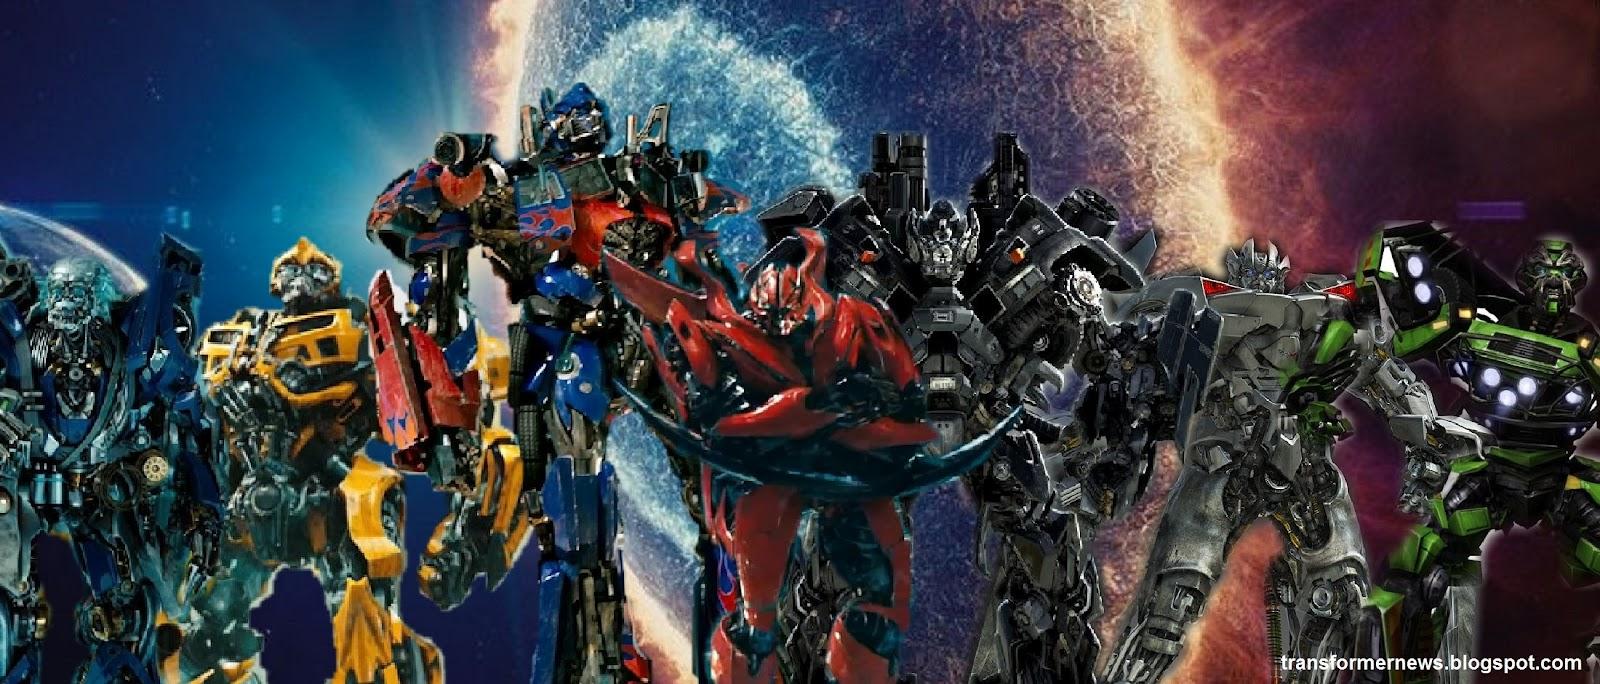 Transformers-3-autobots